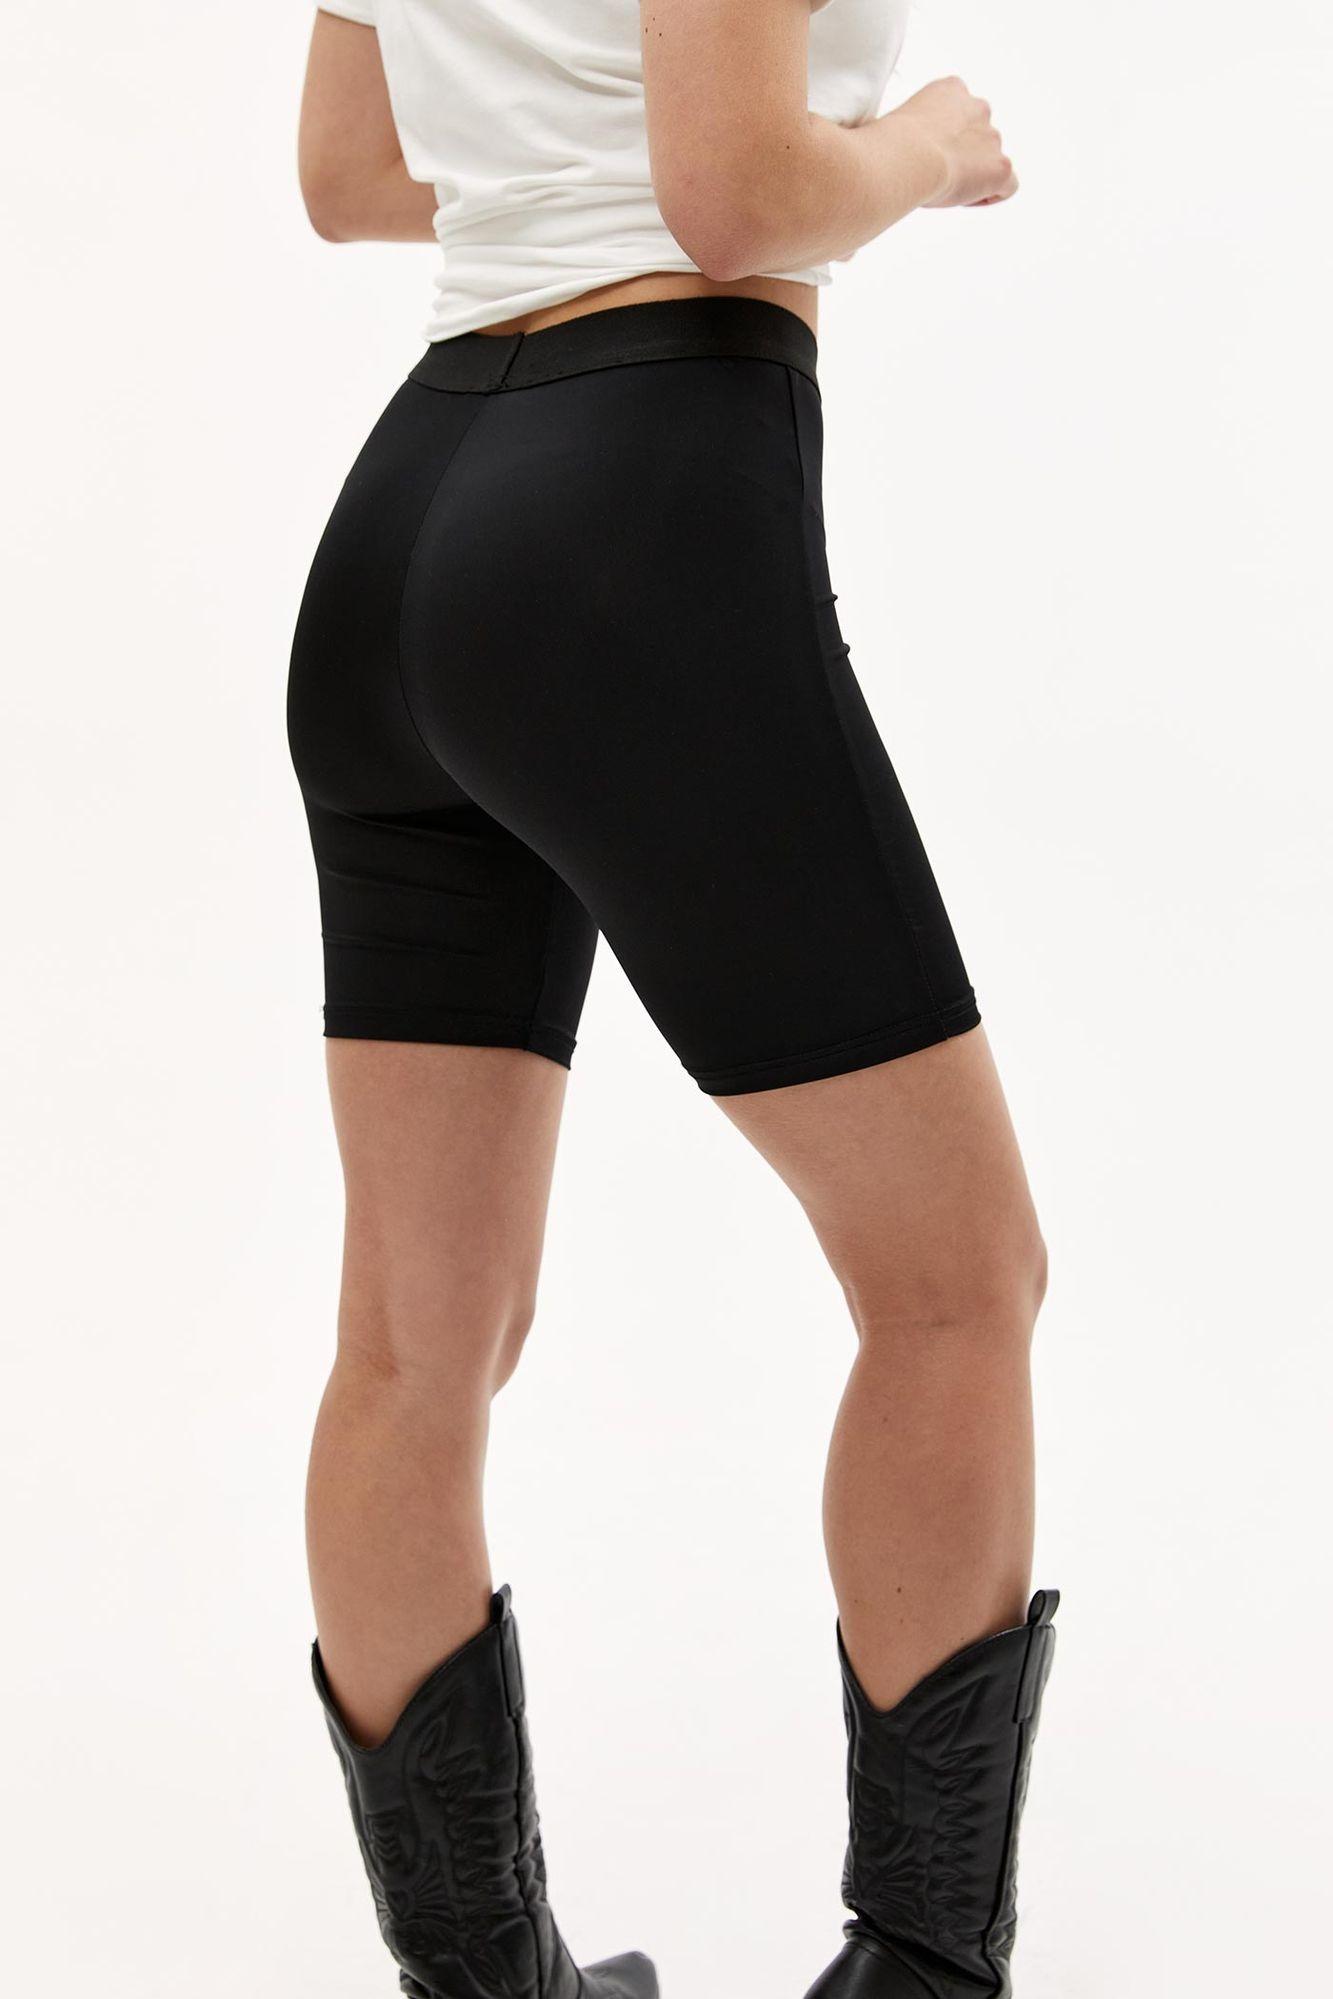 Broek black legging short Dance with me-4